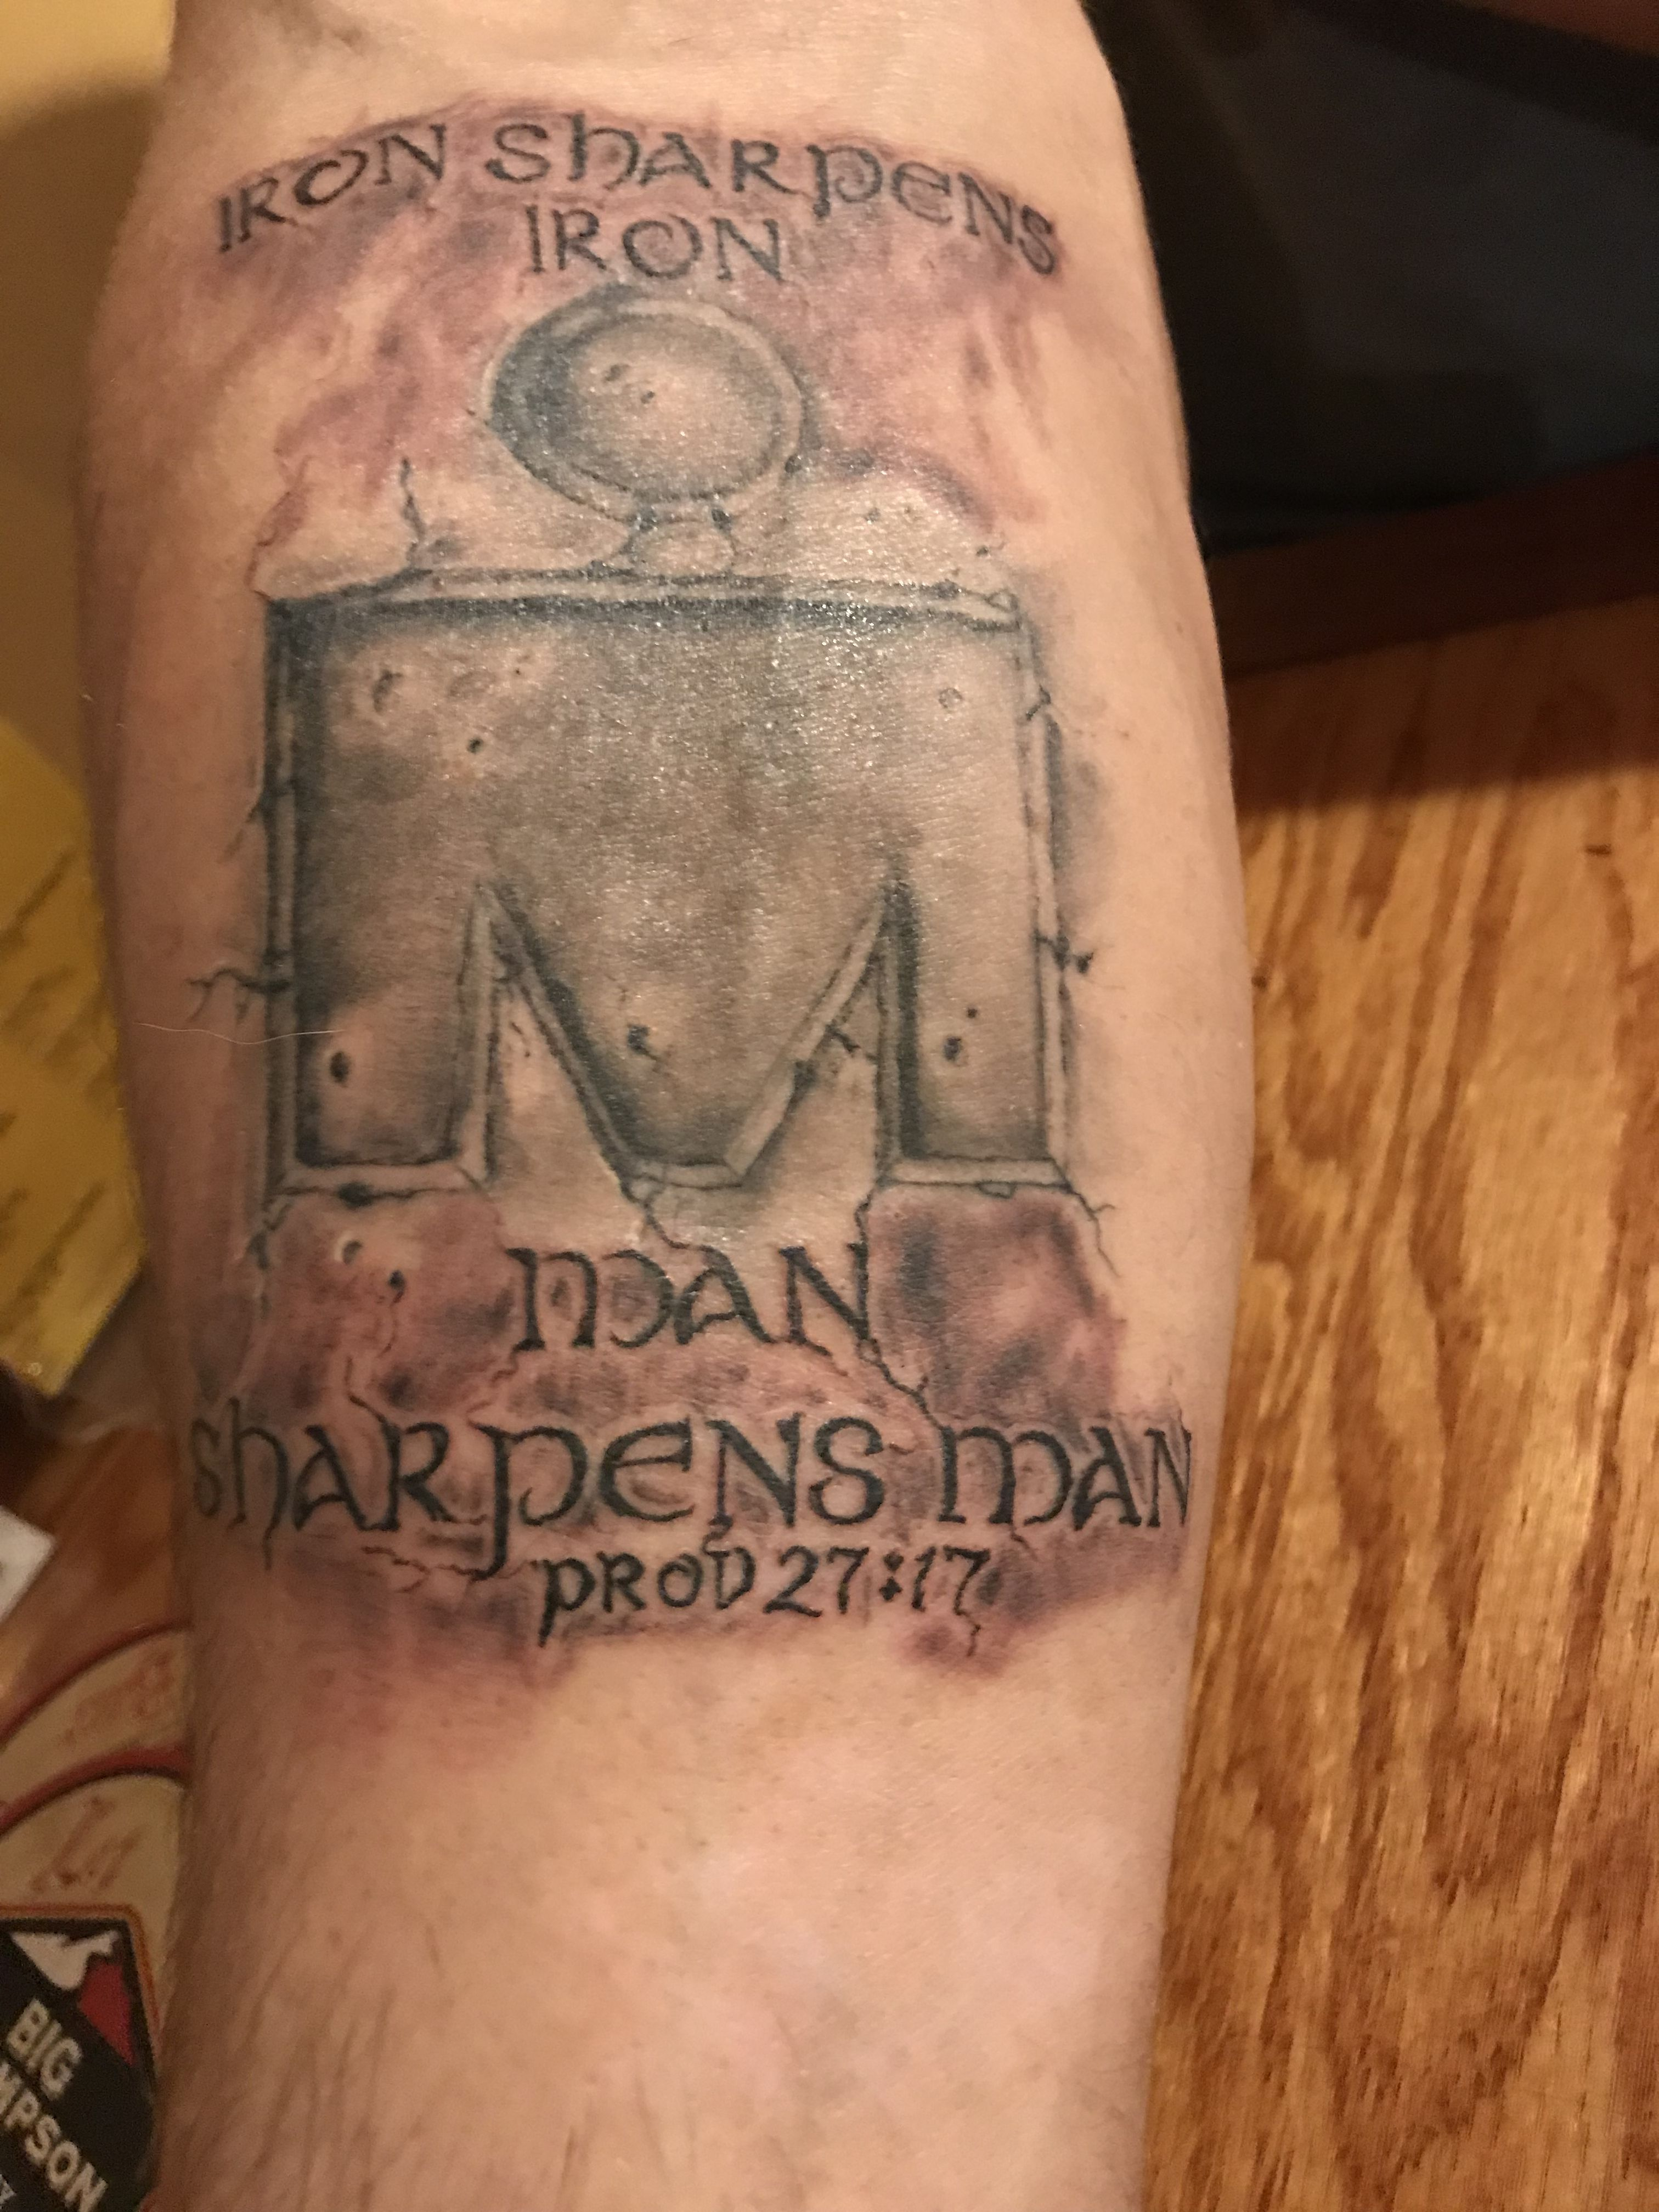 Iron Sharpens Iron Tattoo : sharpens, tattoo, Ironman, Tattoo...iron, Sharpens, Iron., Tattoo,, Iron,, Tattoos